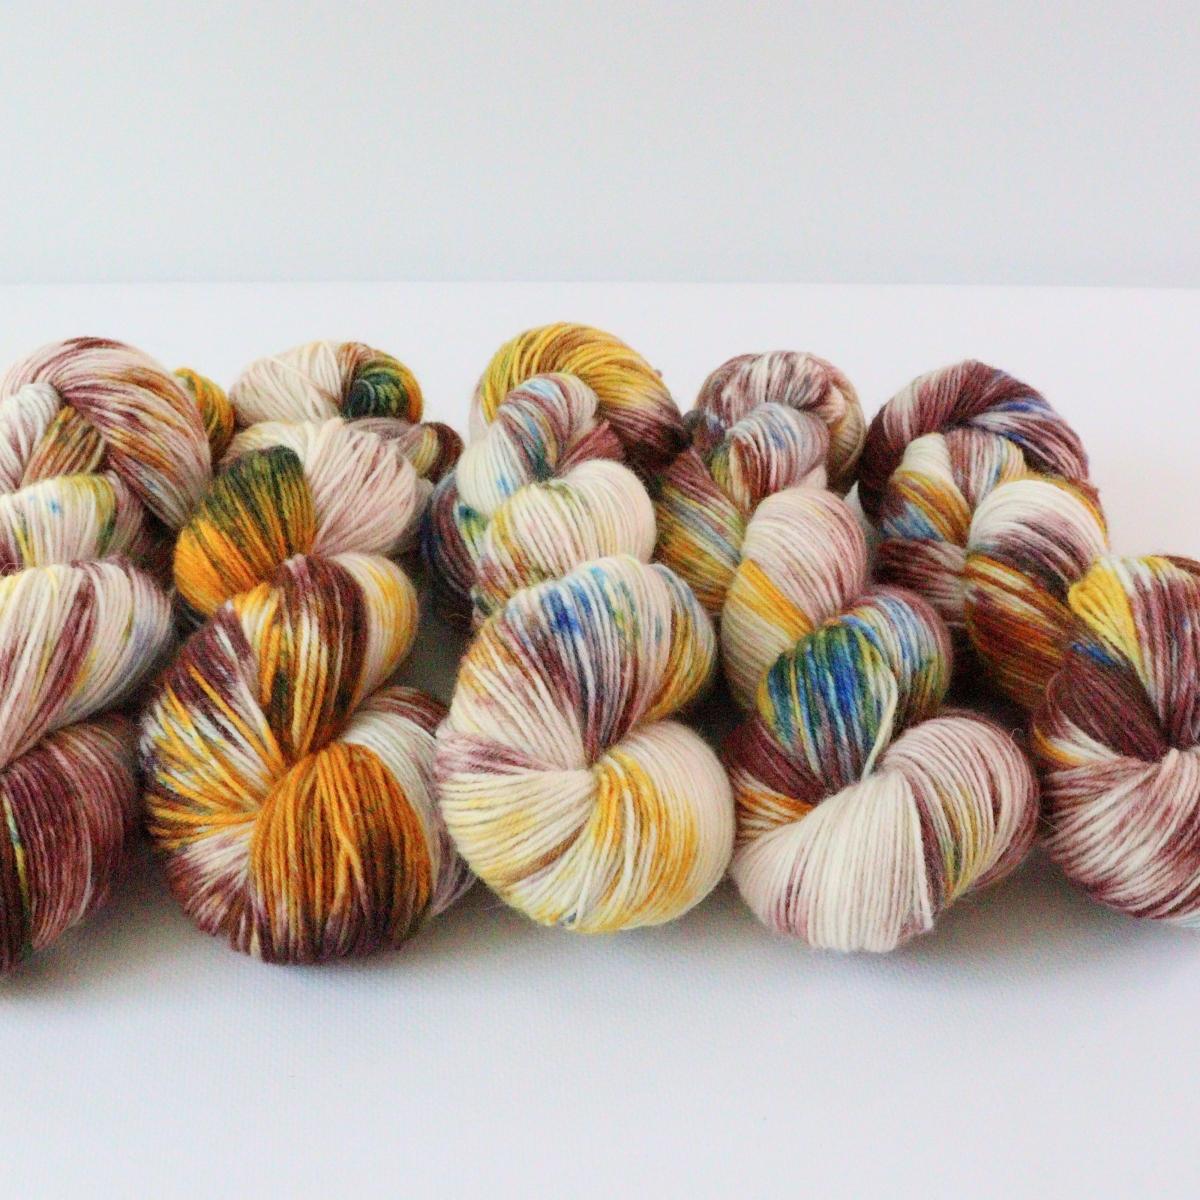 woodico.pro hand dyed yarn 089 3 1200x1200 - Hand dyed yarn / 089